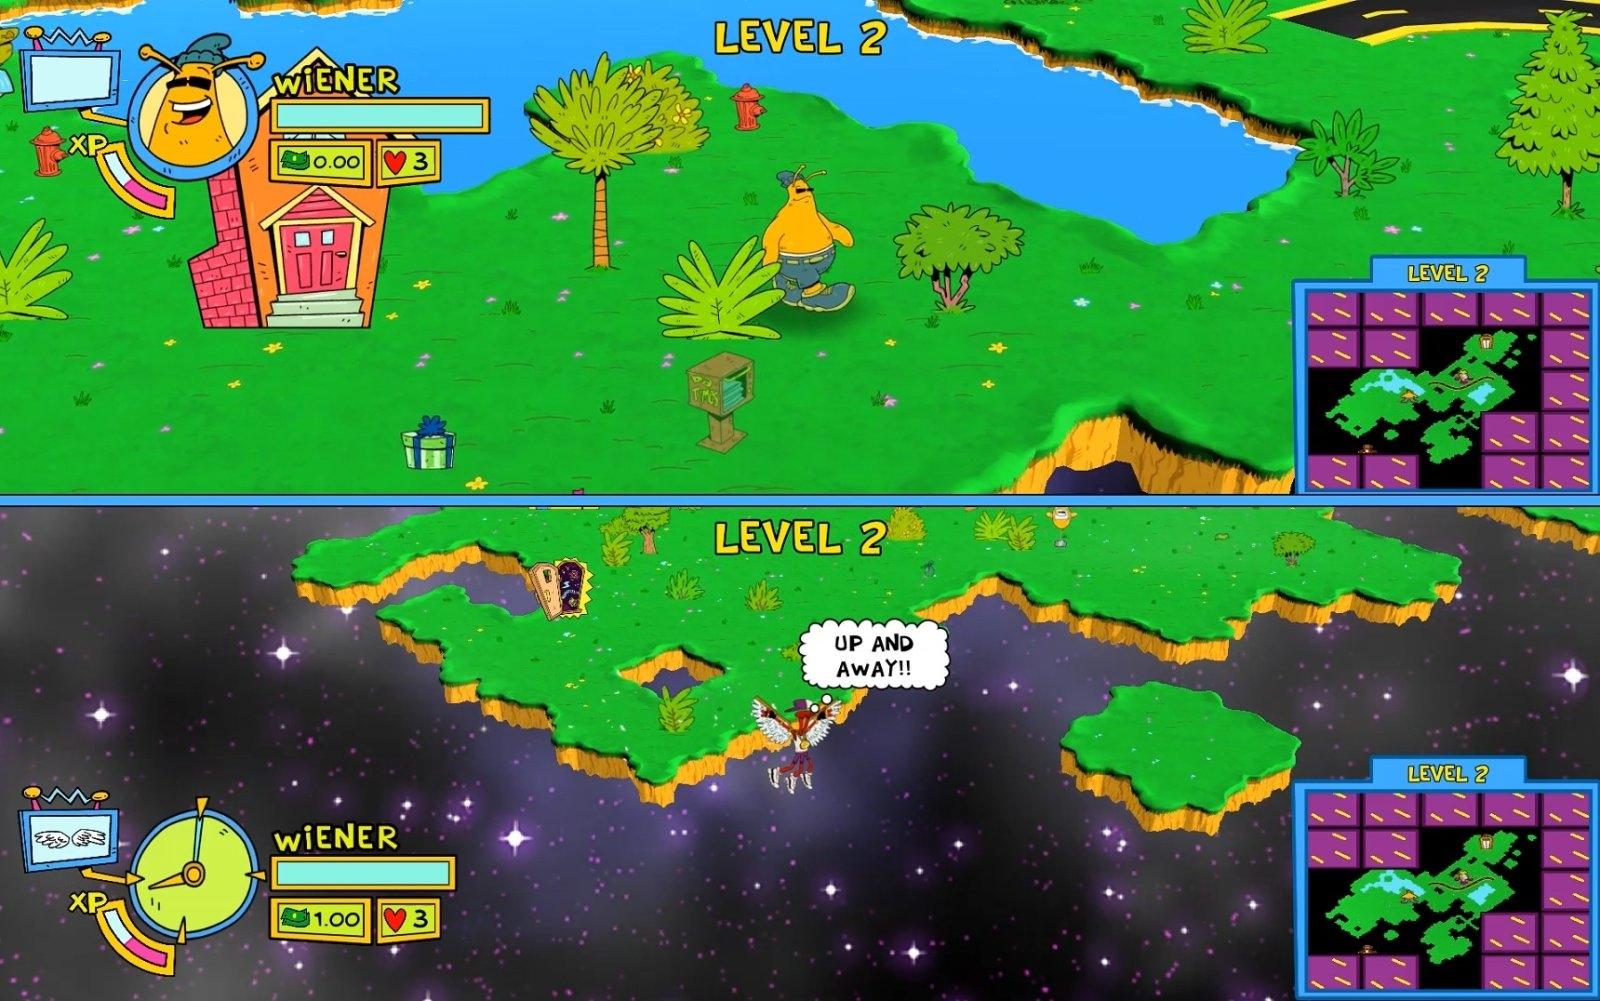 Meet Macaulay Culkin, retro video game nerd | DeviceDaily.com